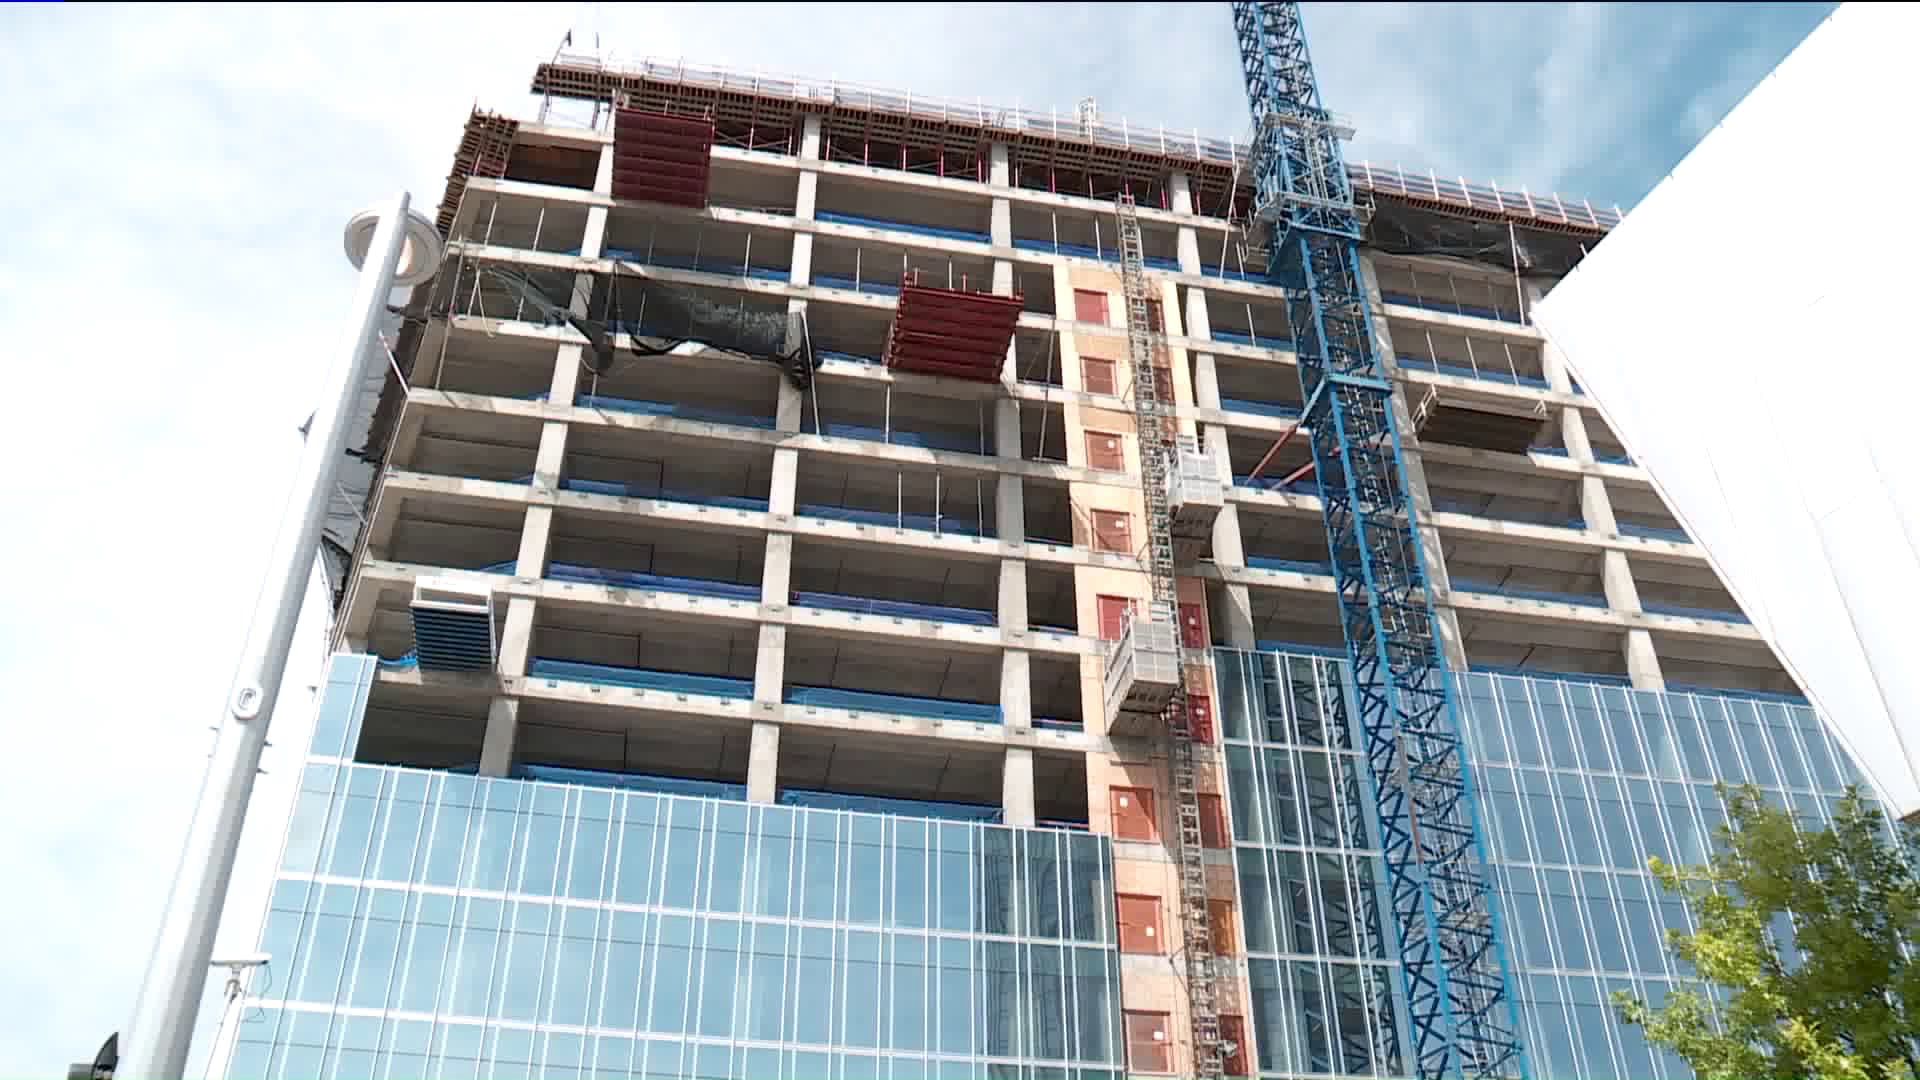 Construction worker dies after scissor lift falls 14 stories